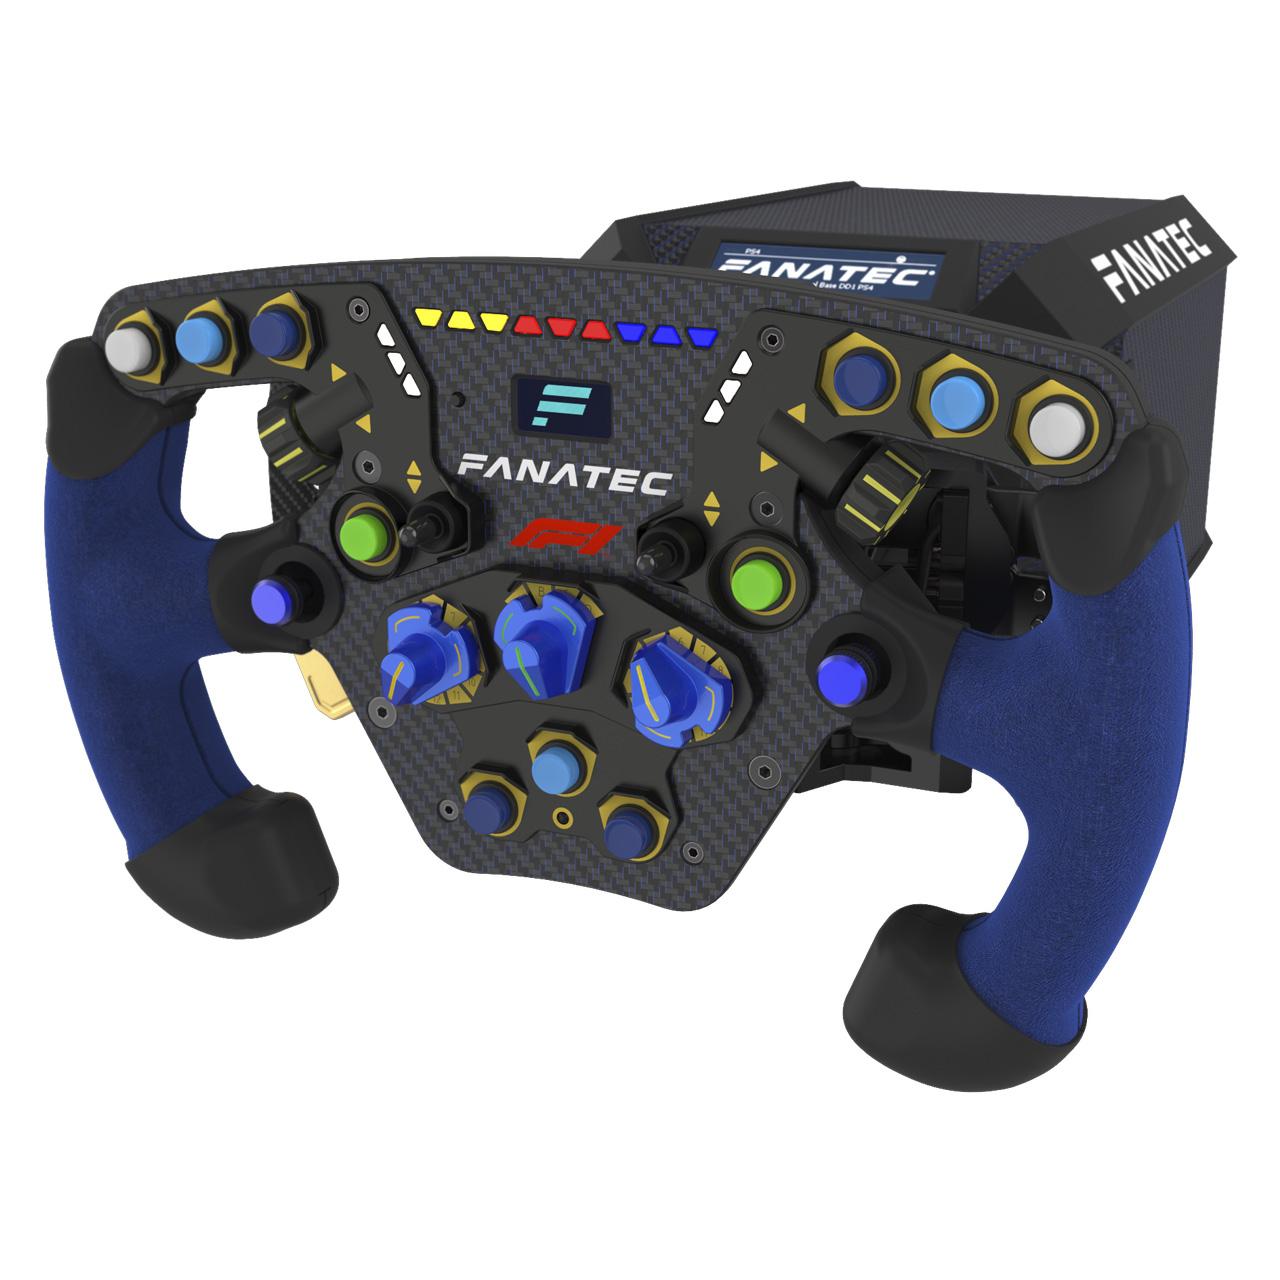 PC Steering- & Racing Wheels for Sim Racers | Fanatec